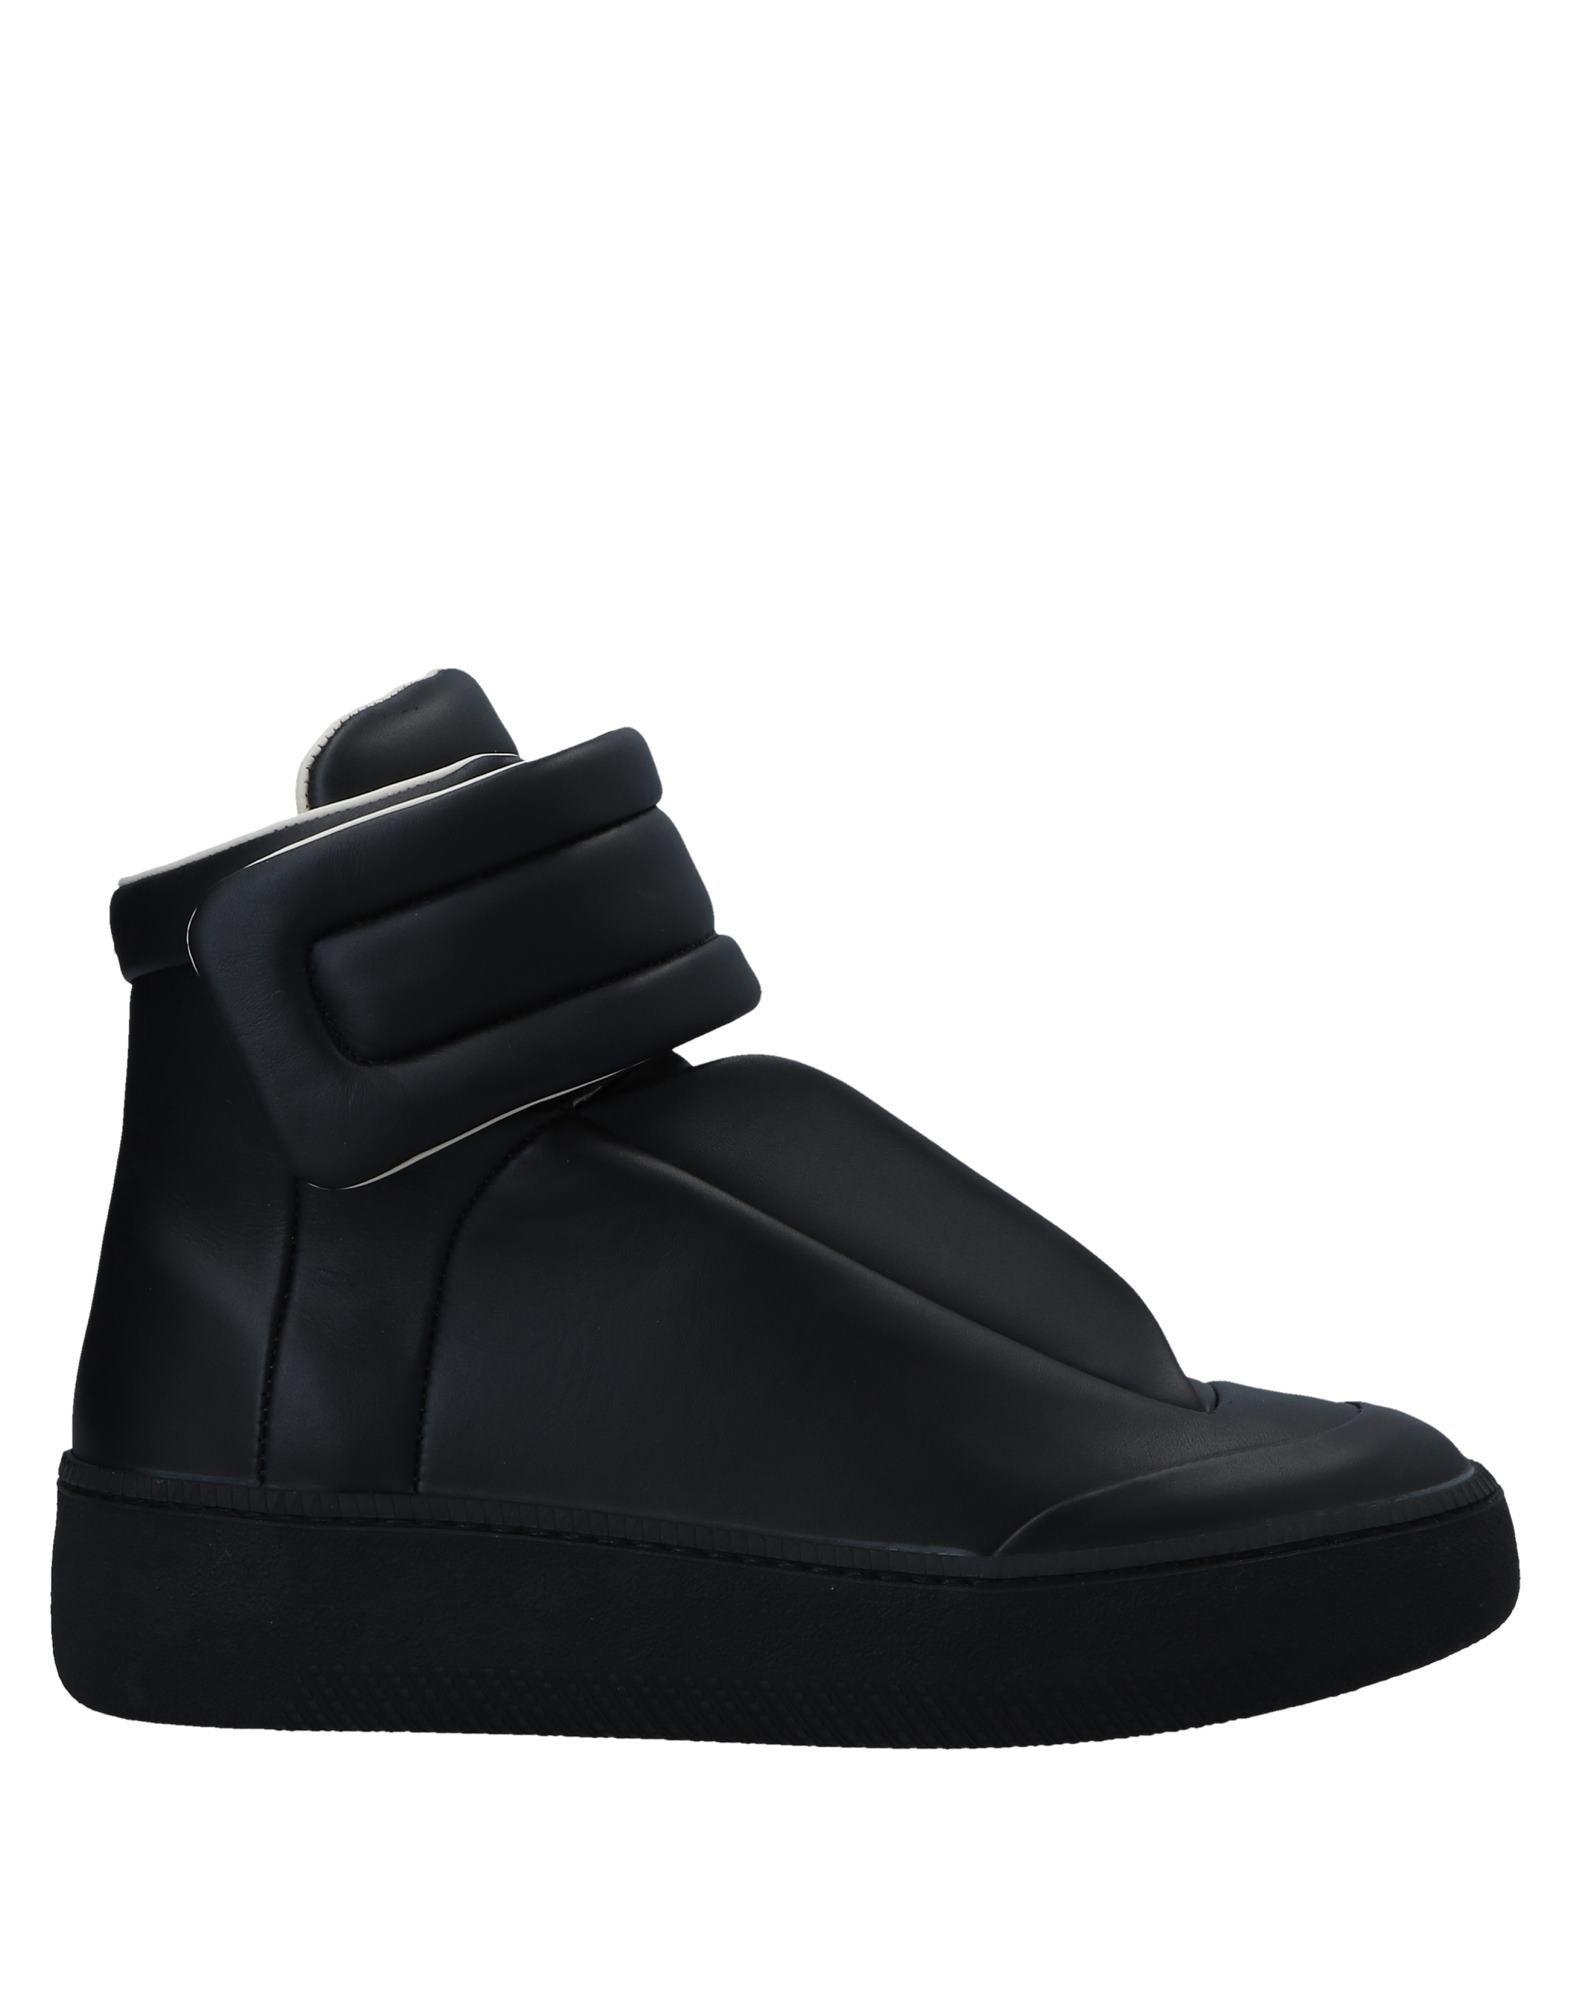 Maison Margiela Sneakers Herren  11551265SQ Gute Qualität beliebte Schuhe